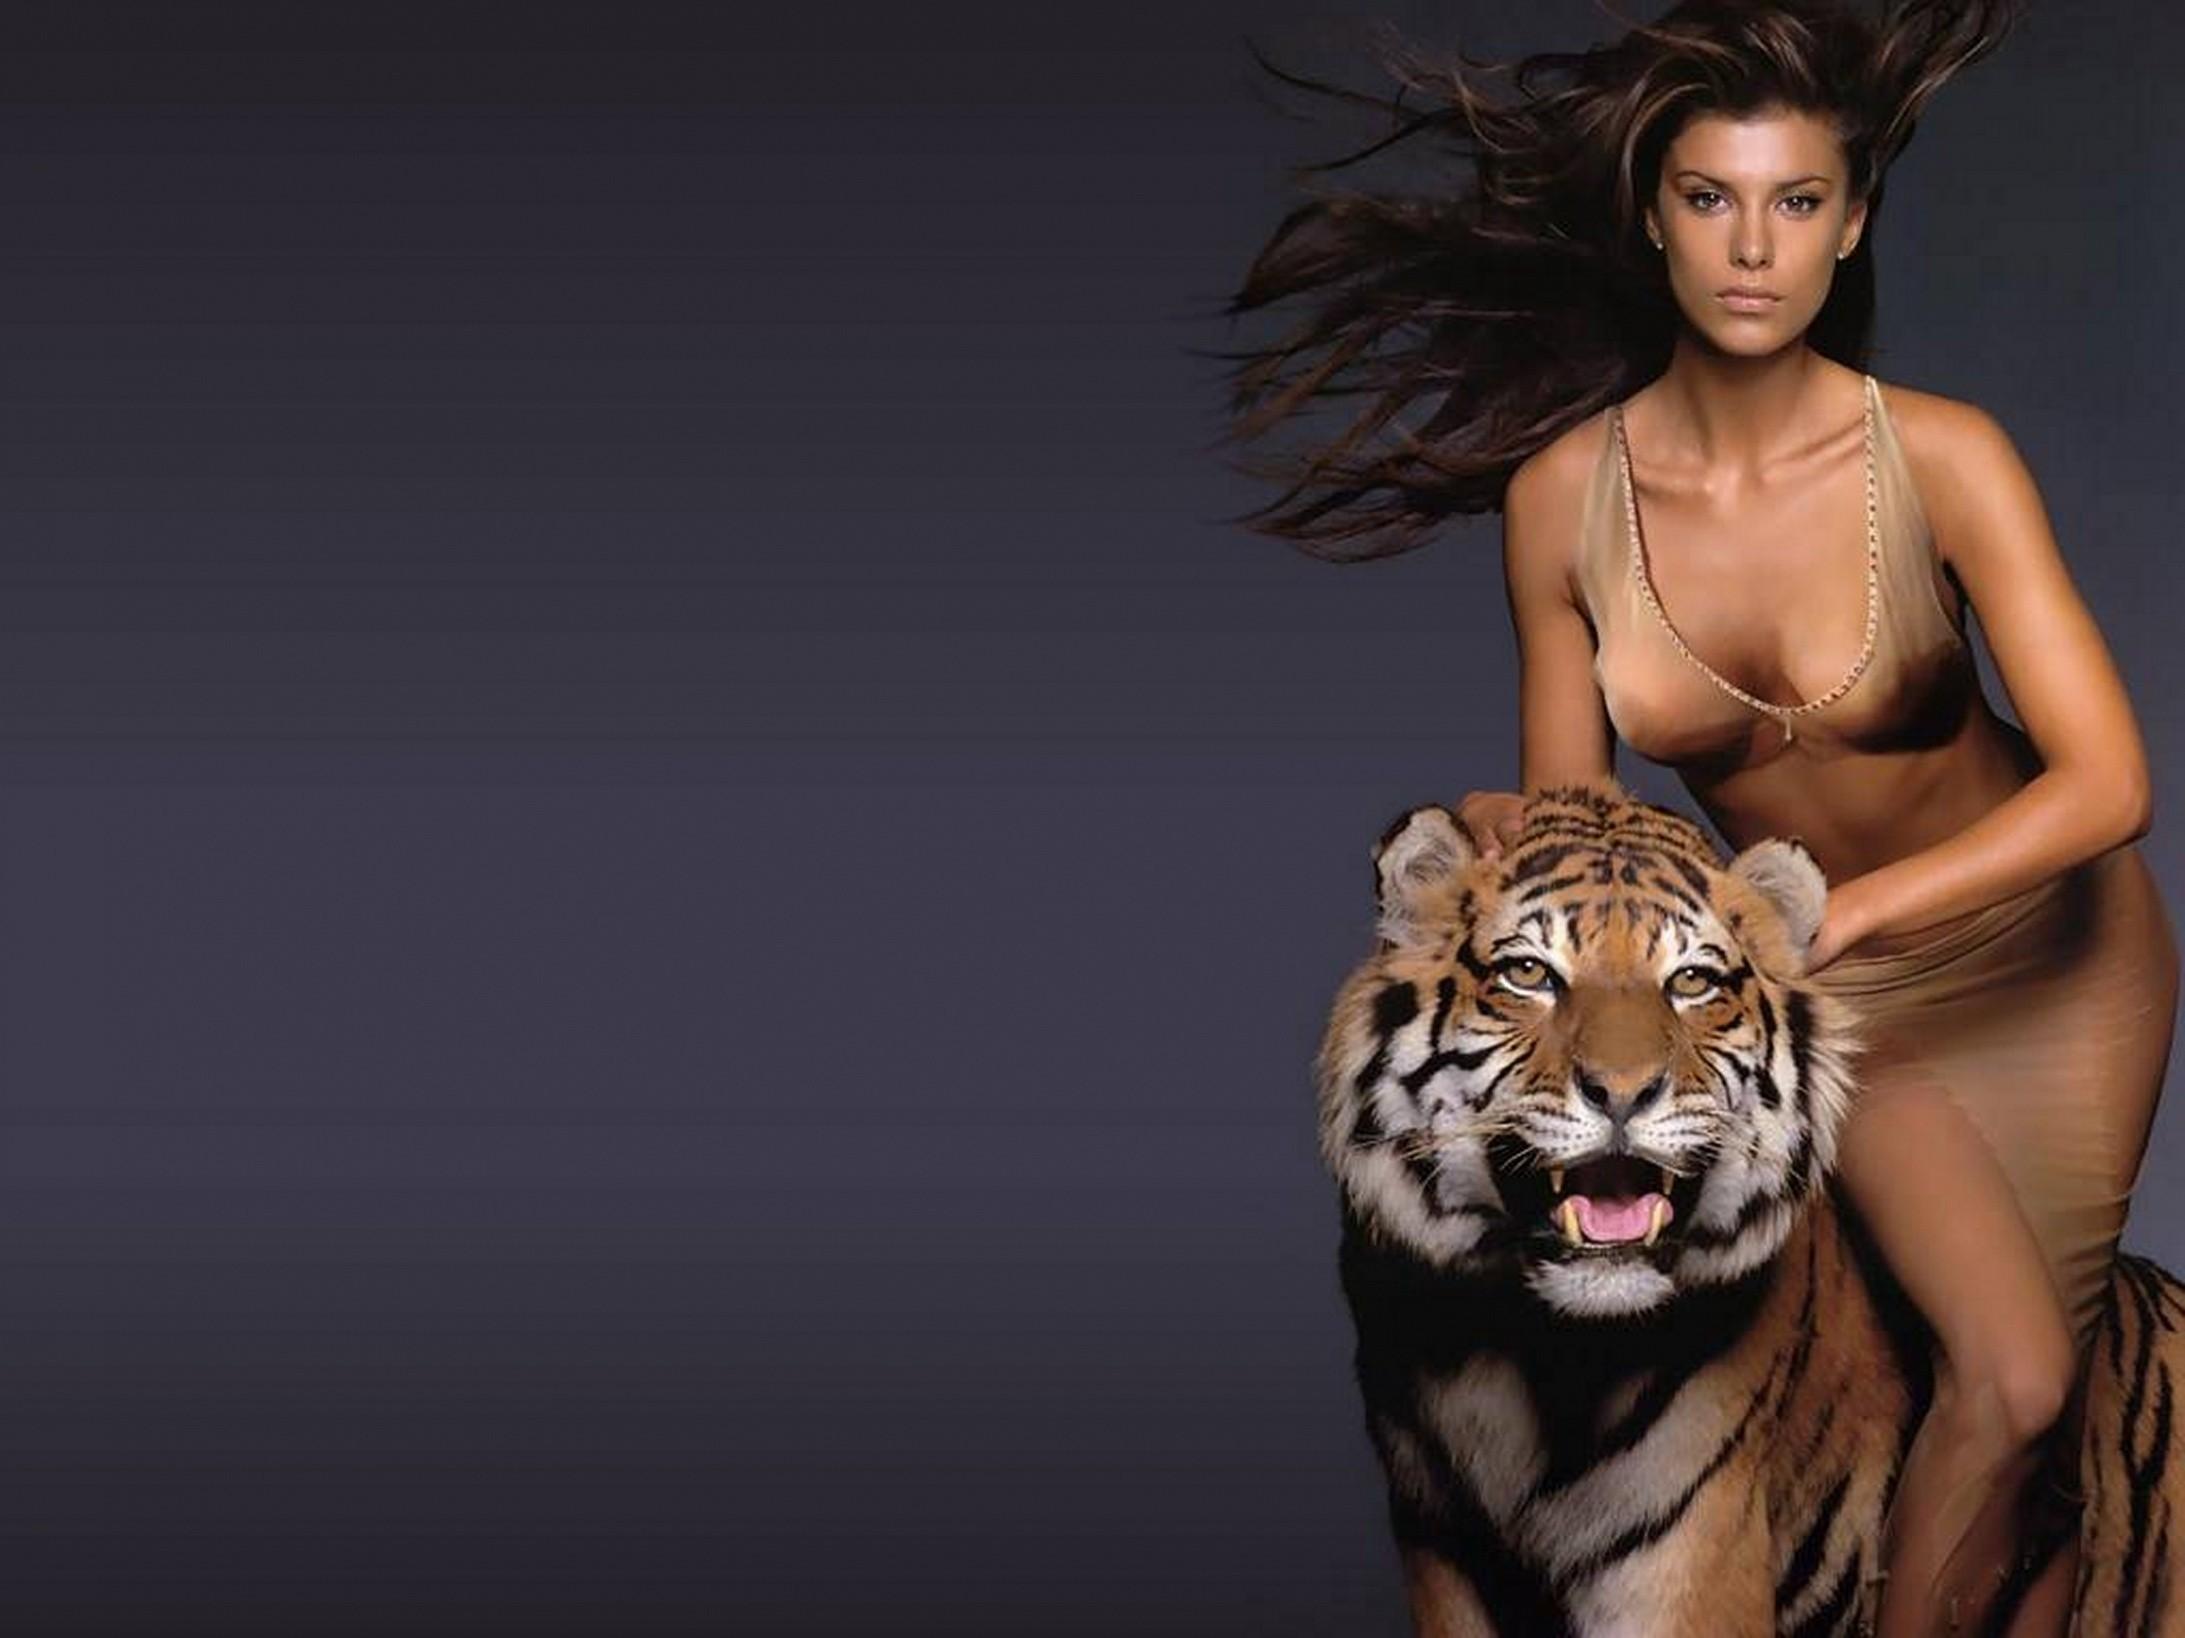 Секс с тигром фото 16 фотография